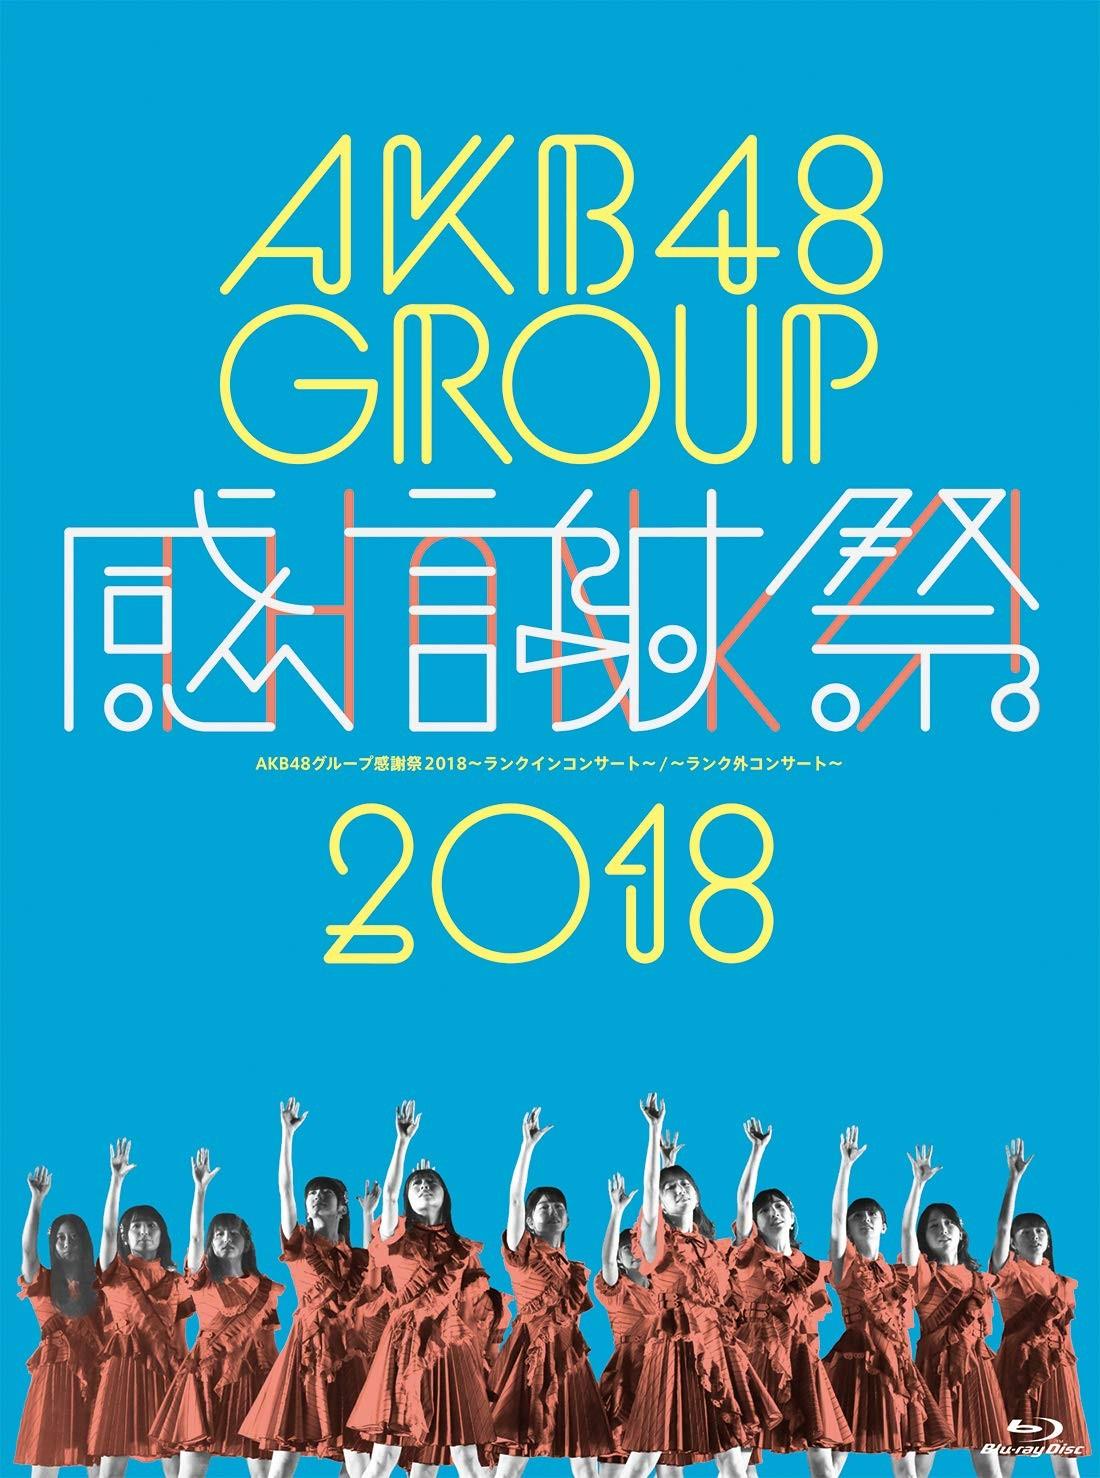 AKB48 – AKB48グループ感謝祭2018~ランクインコンサート/ランク外コンサート~ (Blu-ray Disc5枚組) [Blu-Ray ISO + BDRip 1080p] [2019.01.09]